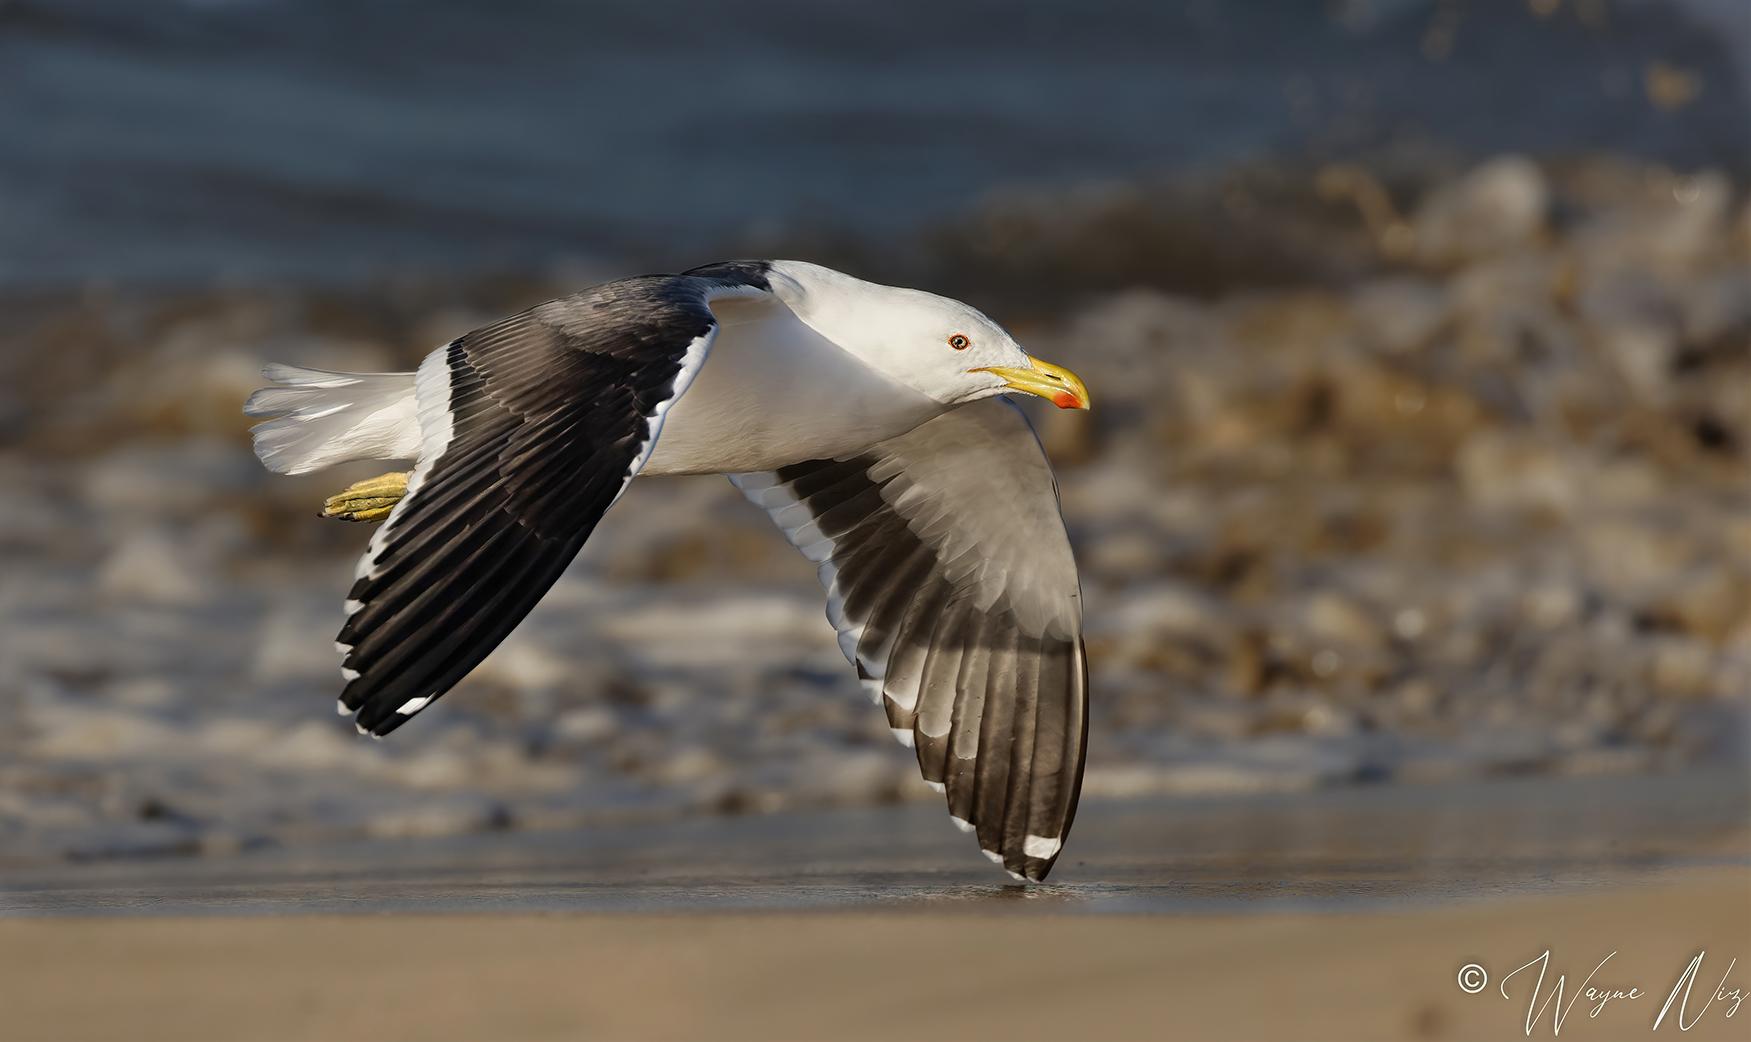 Name:  Gull Small 2.jpg Views: 56 Size:  598.3 KB